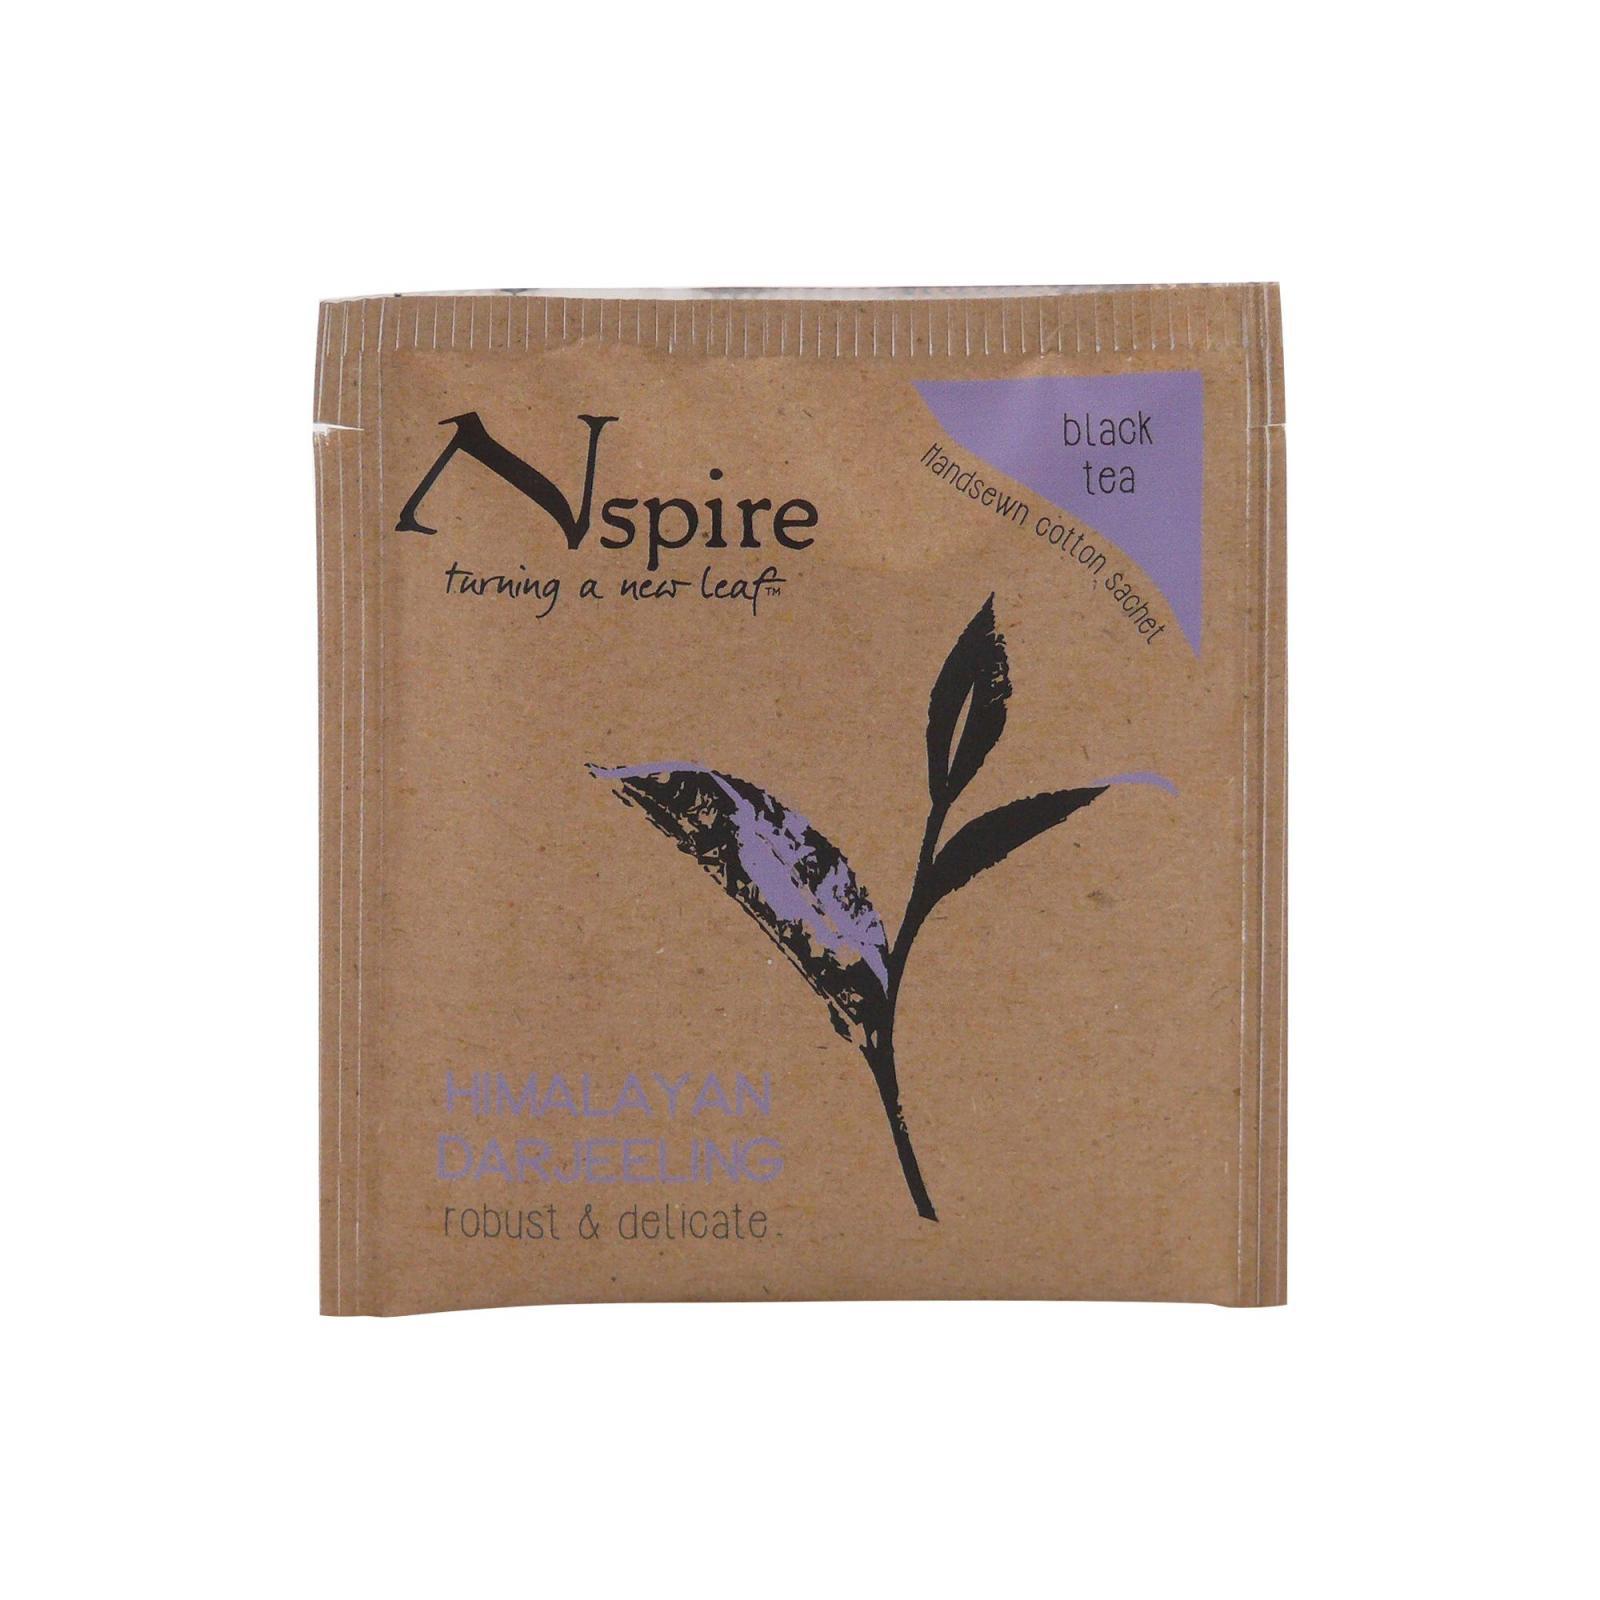 Numi Černý čaj Himalayan Darjeeling, Nspire Tea 2,9 g, 1 ks